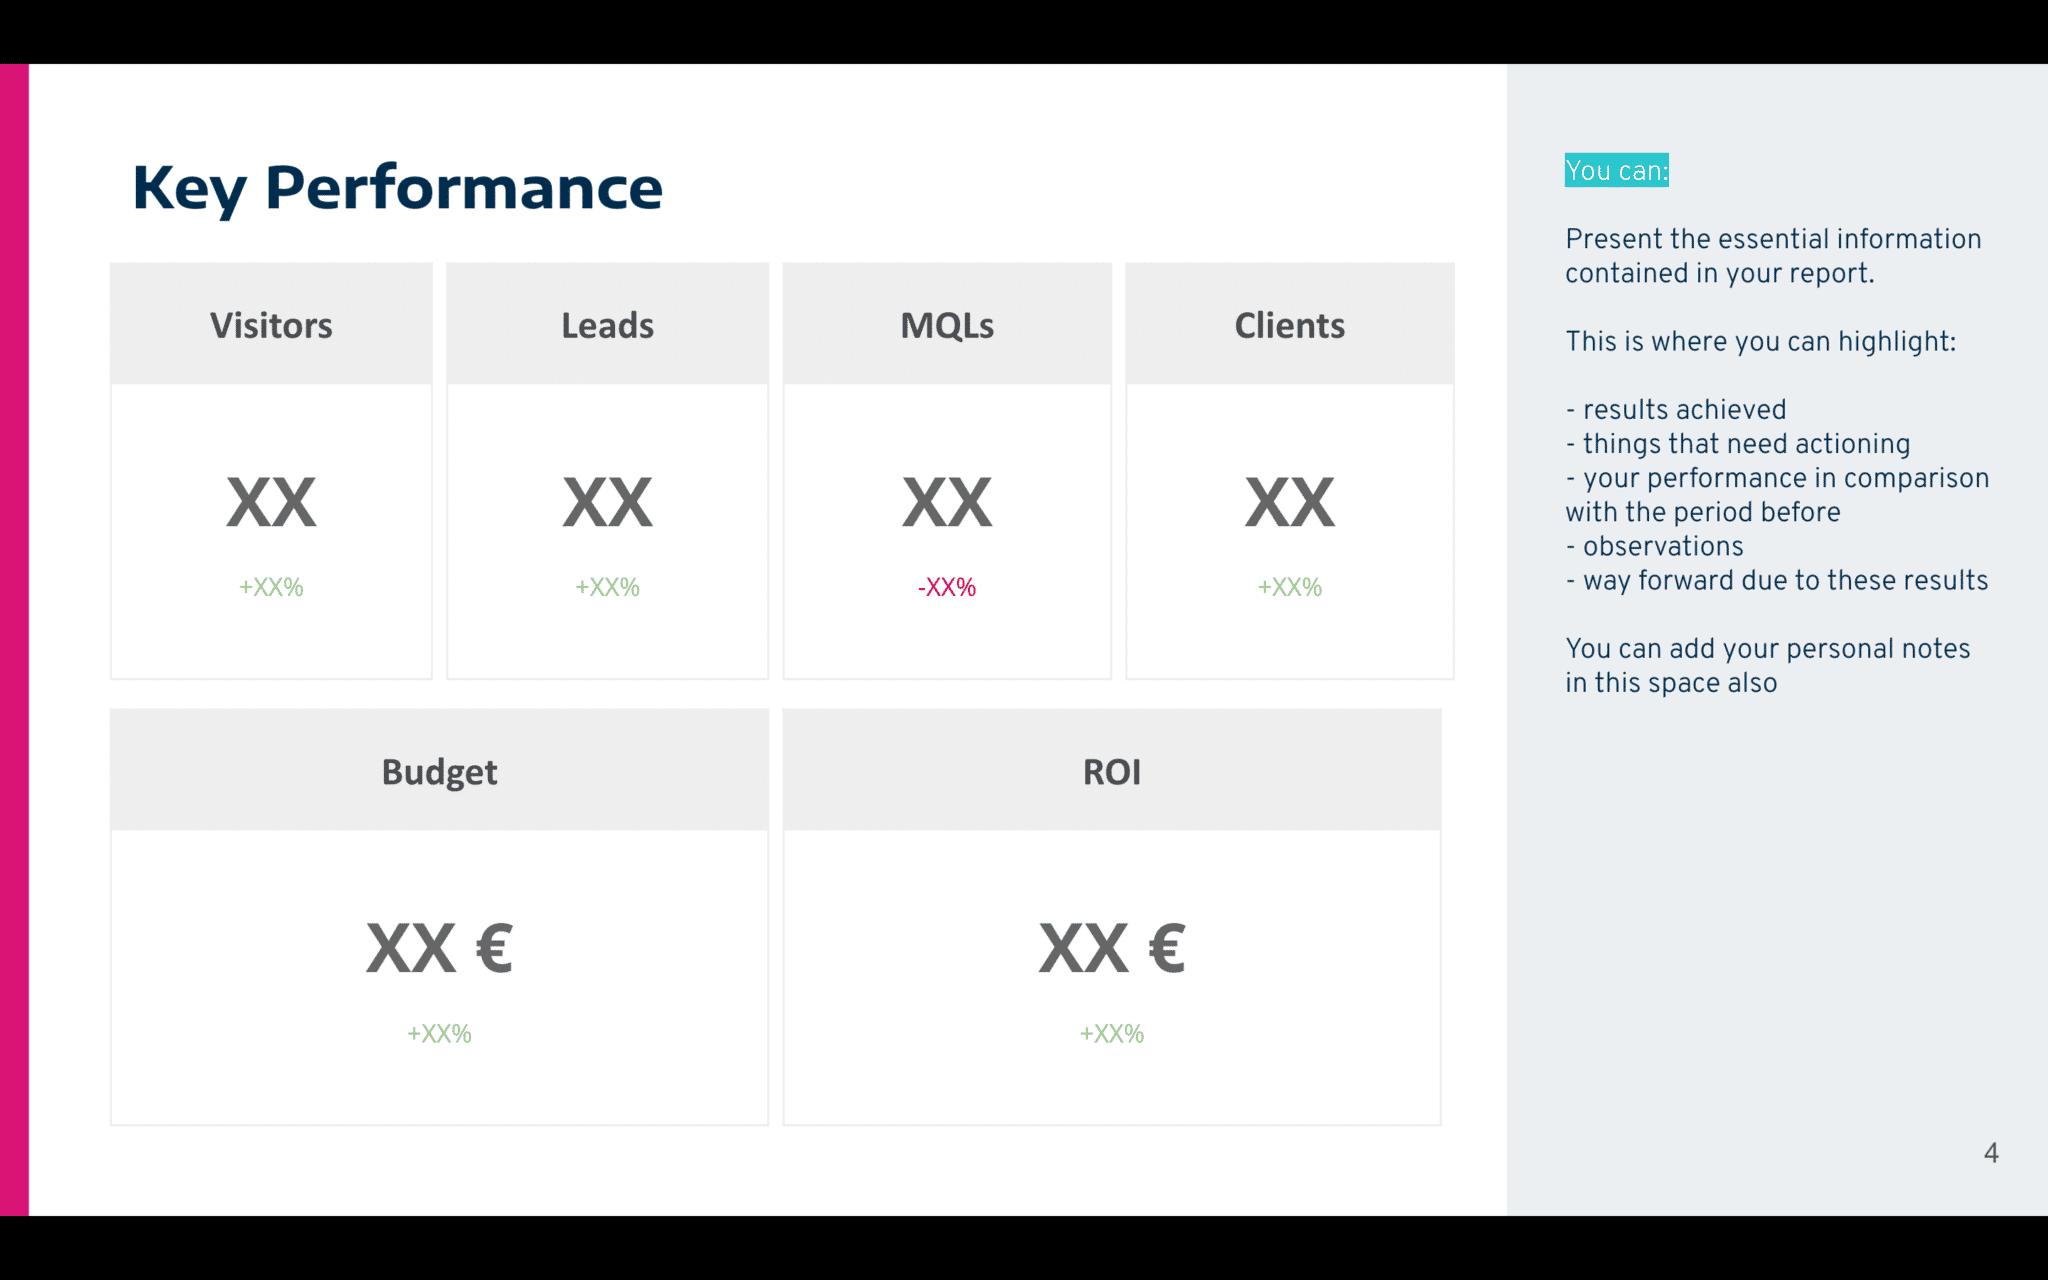 Marketing performance - kpi